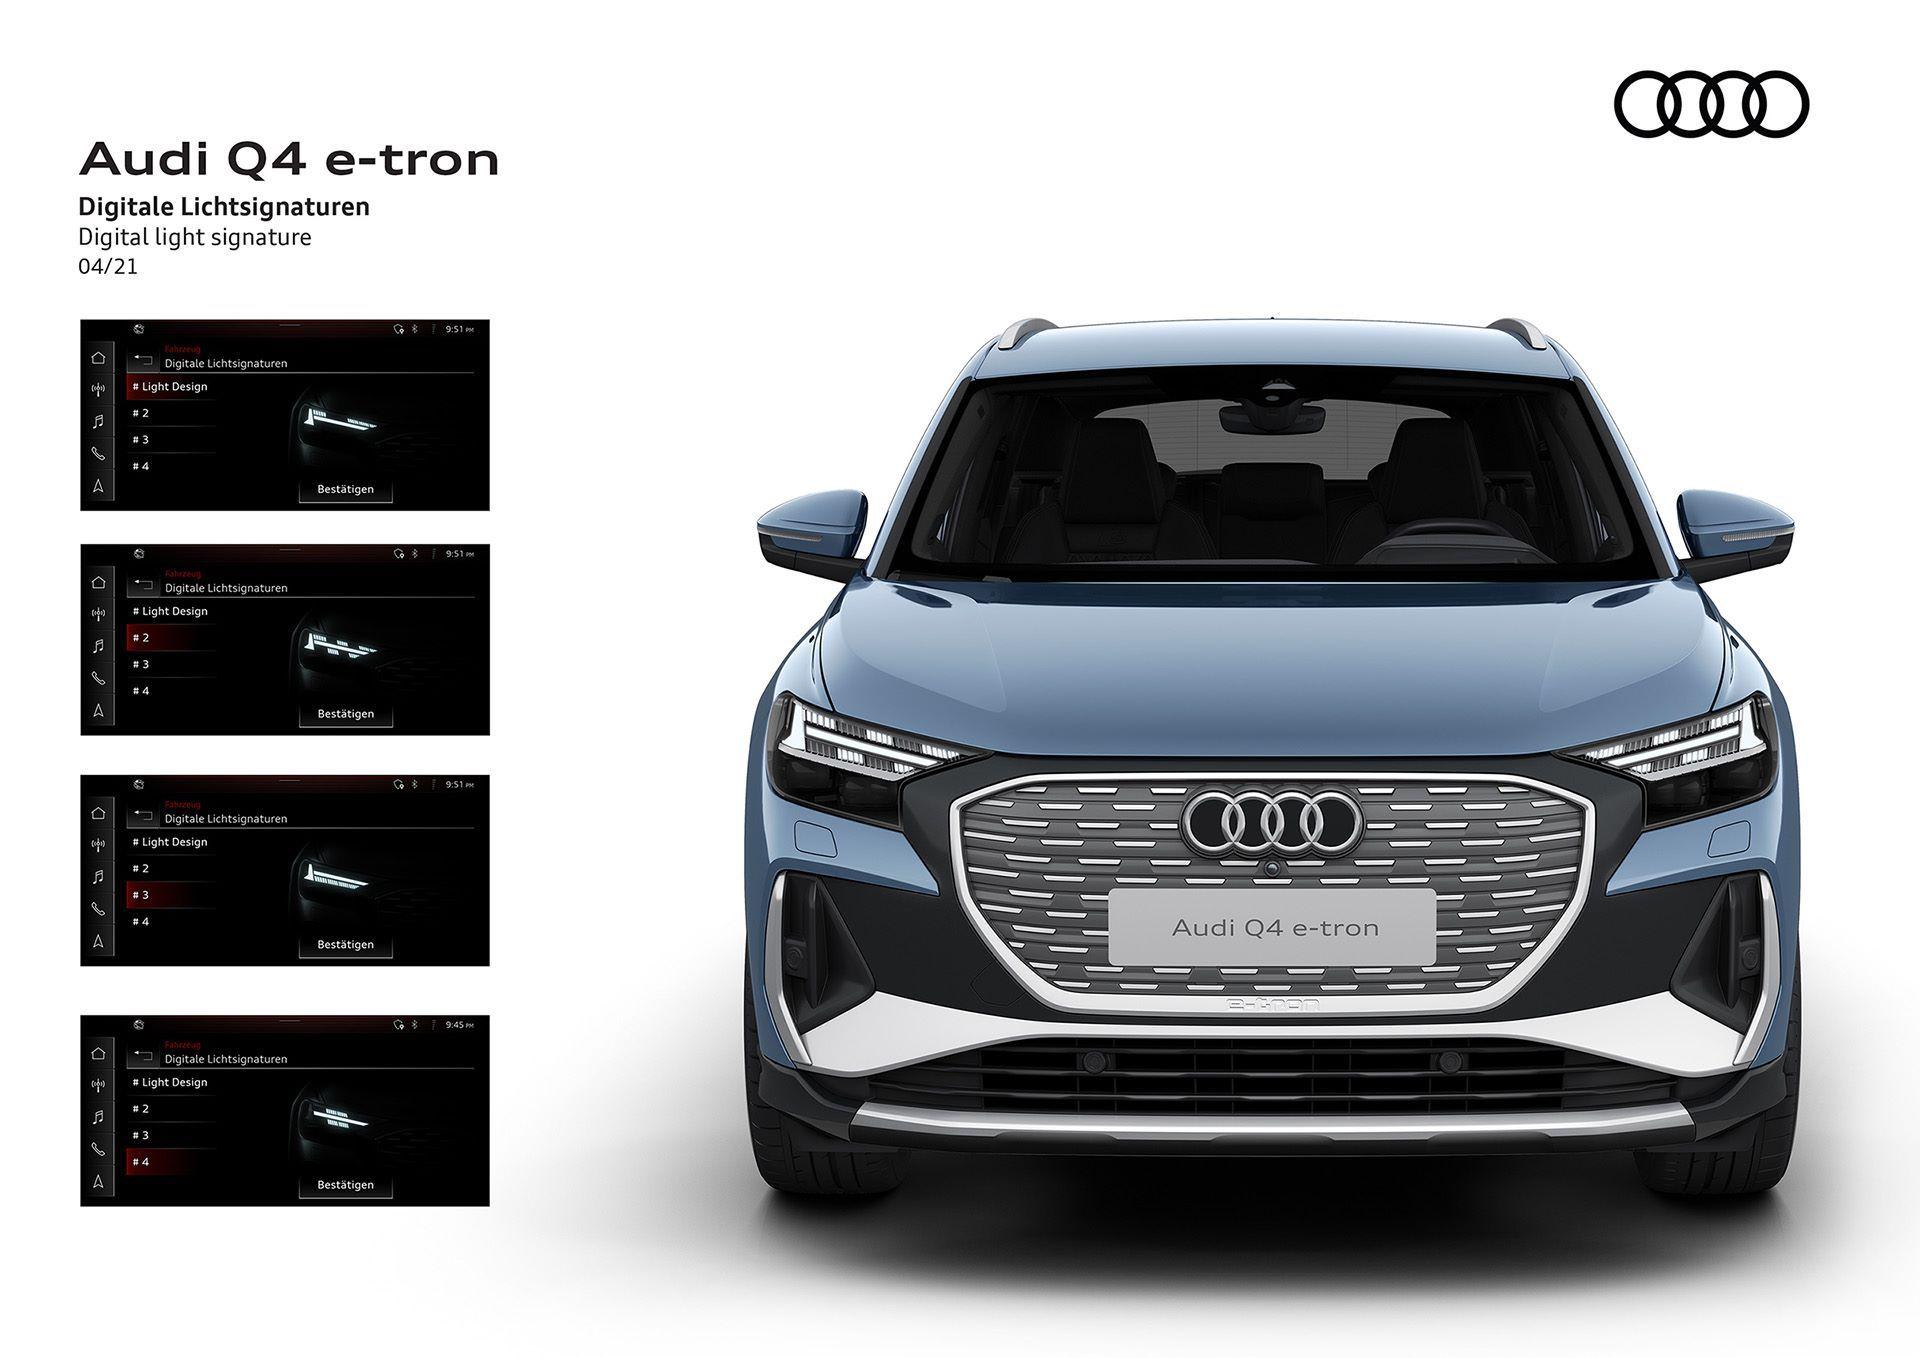 Audi-Q4-e-tron-and-Q4-e-tron-Sportback-170